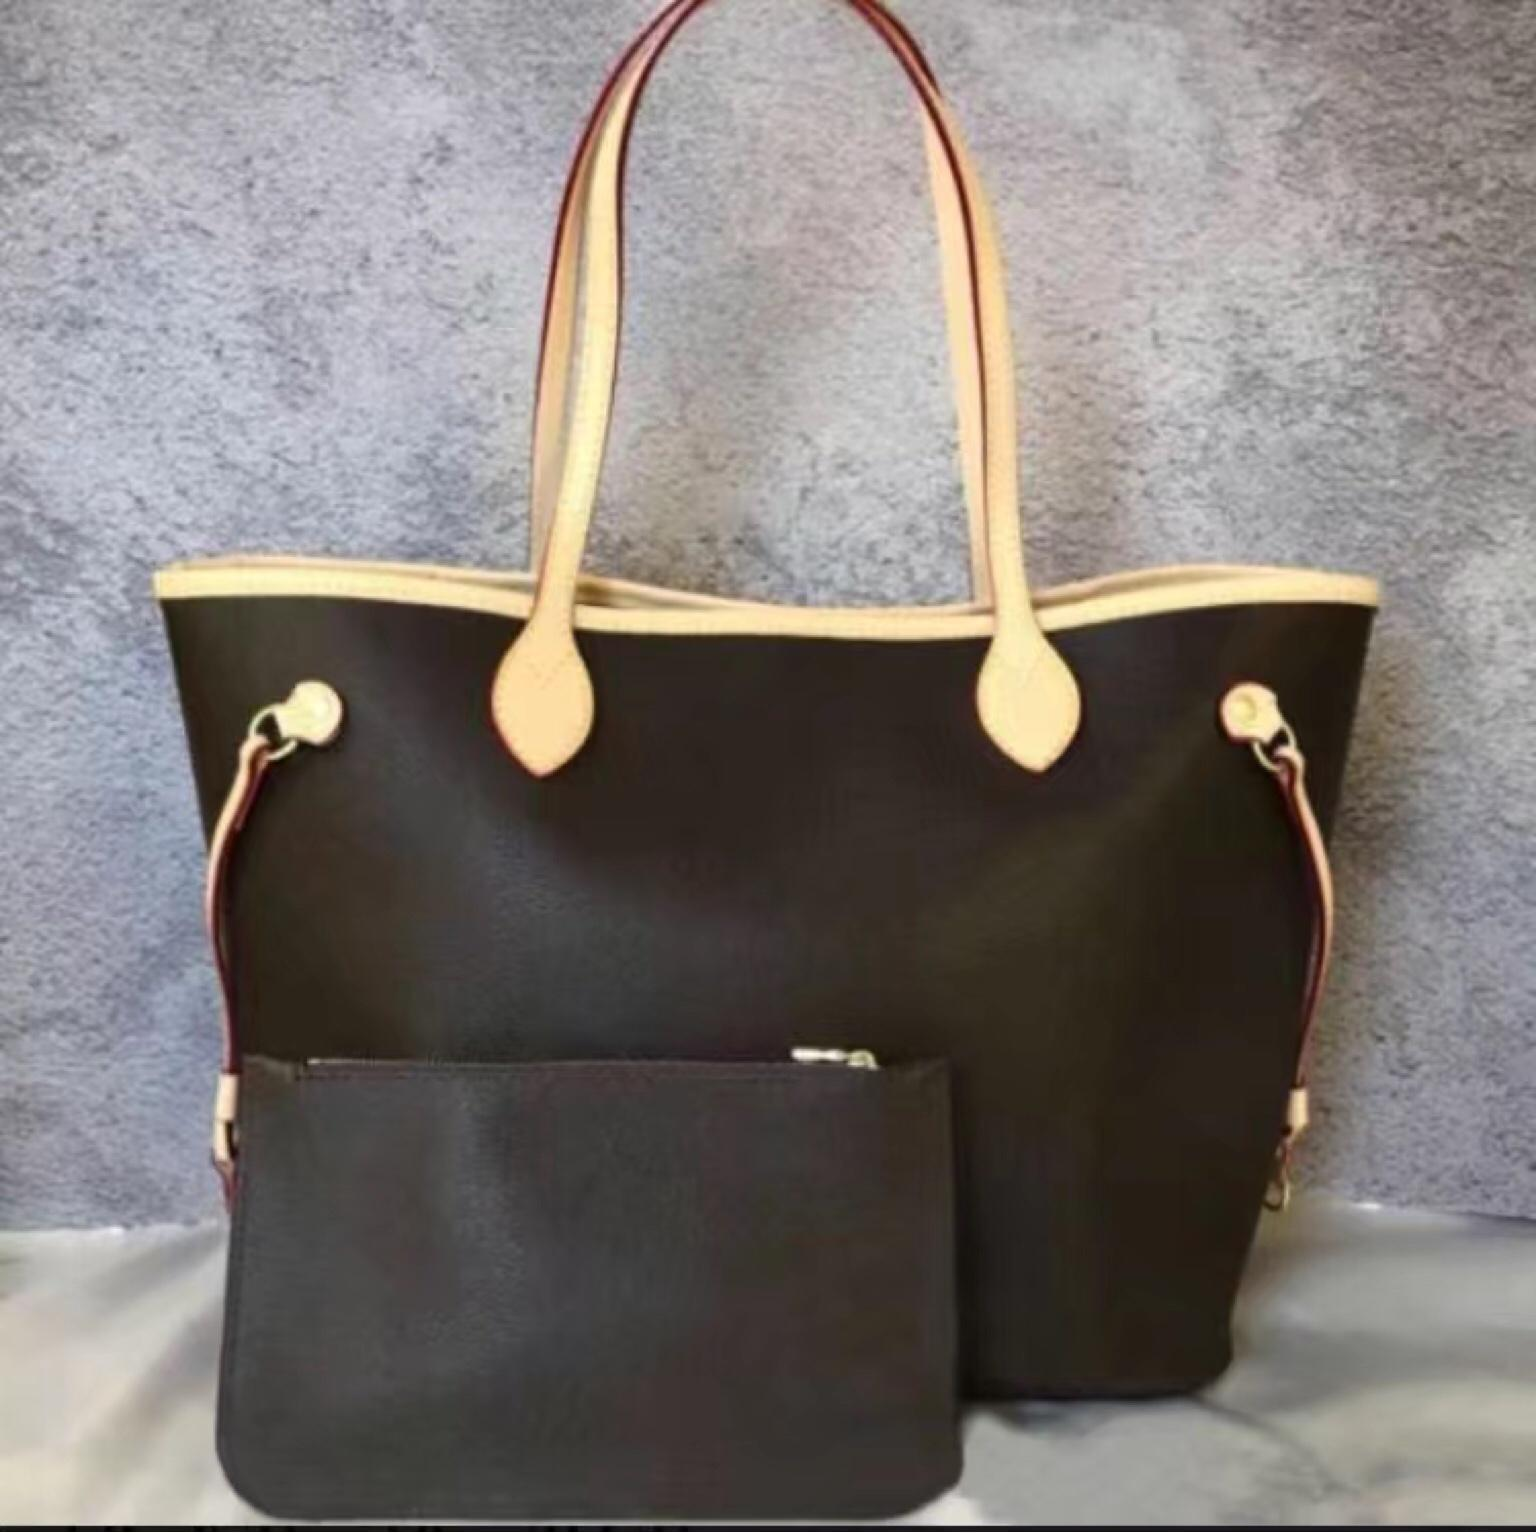 Luxury Designer Open Soft Shopping handBag Women Lady Oxidized Leather Shoulder Straps Never Hobo Bag Full Open Composite Purse Set